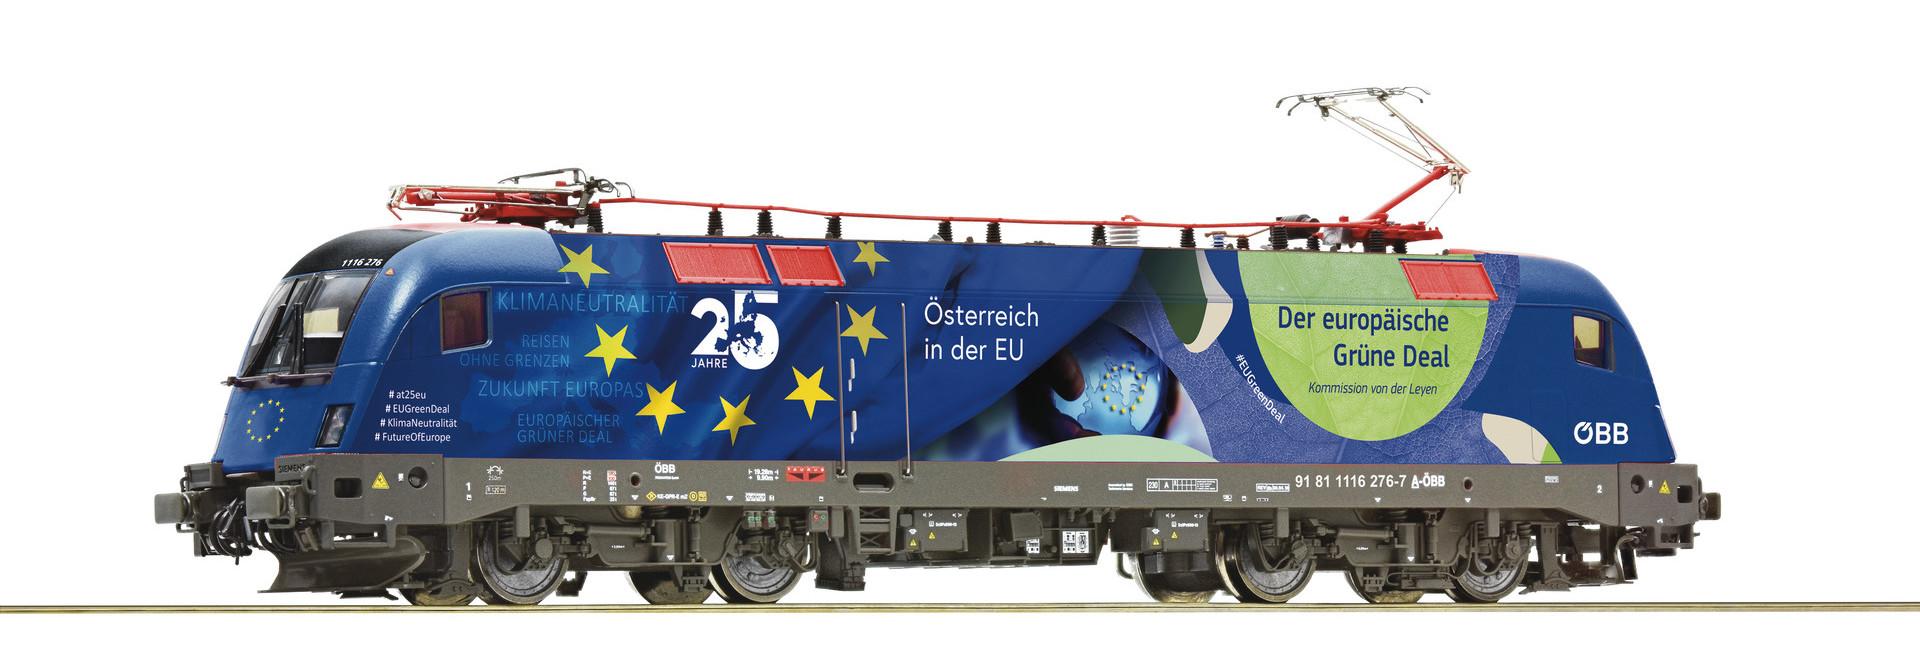 70501 E-Lok 1116 276 EU